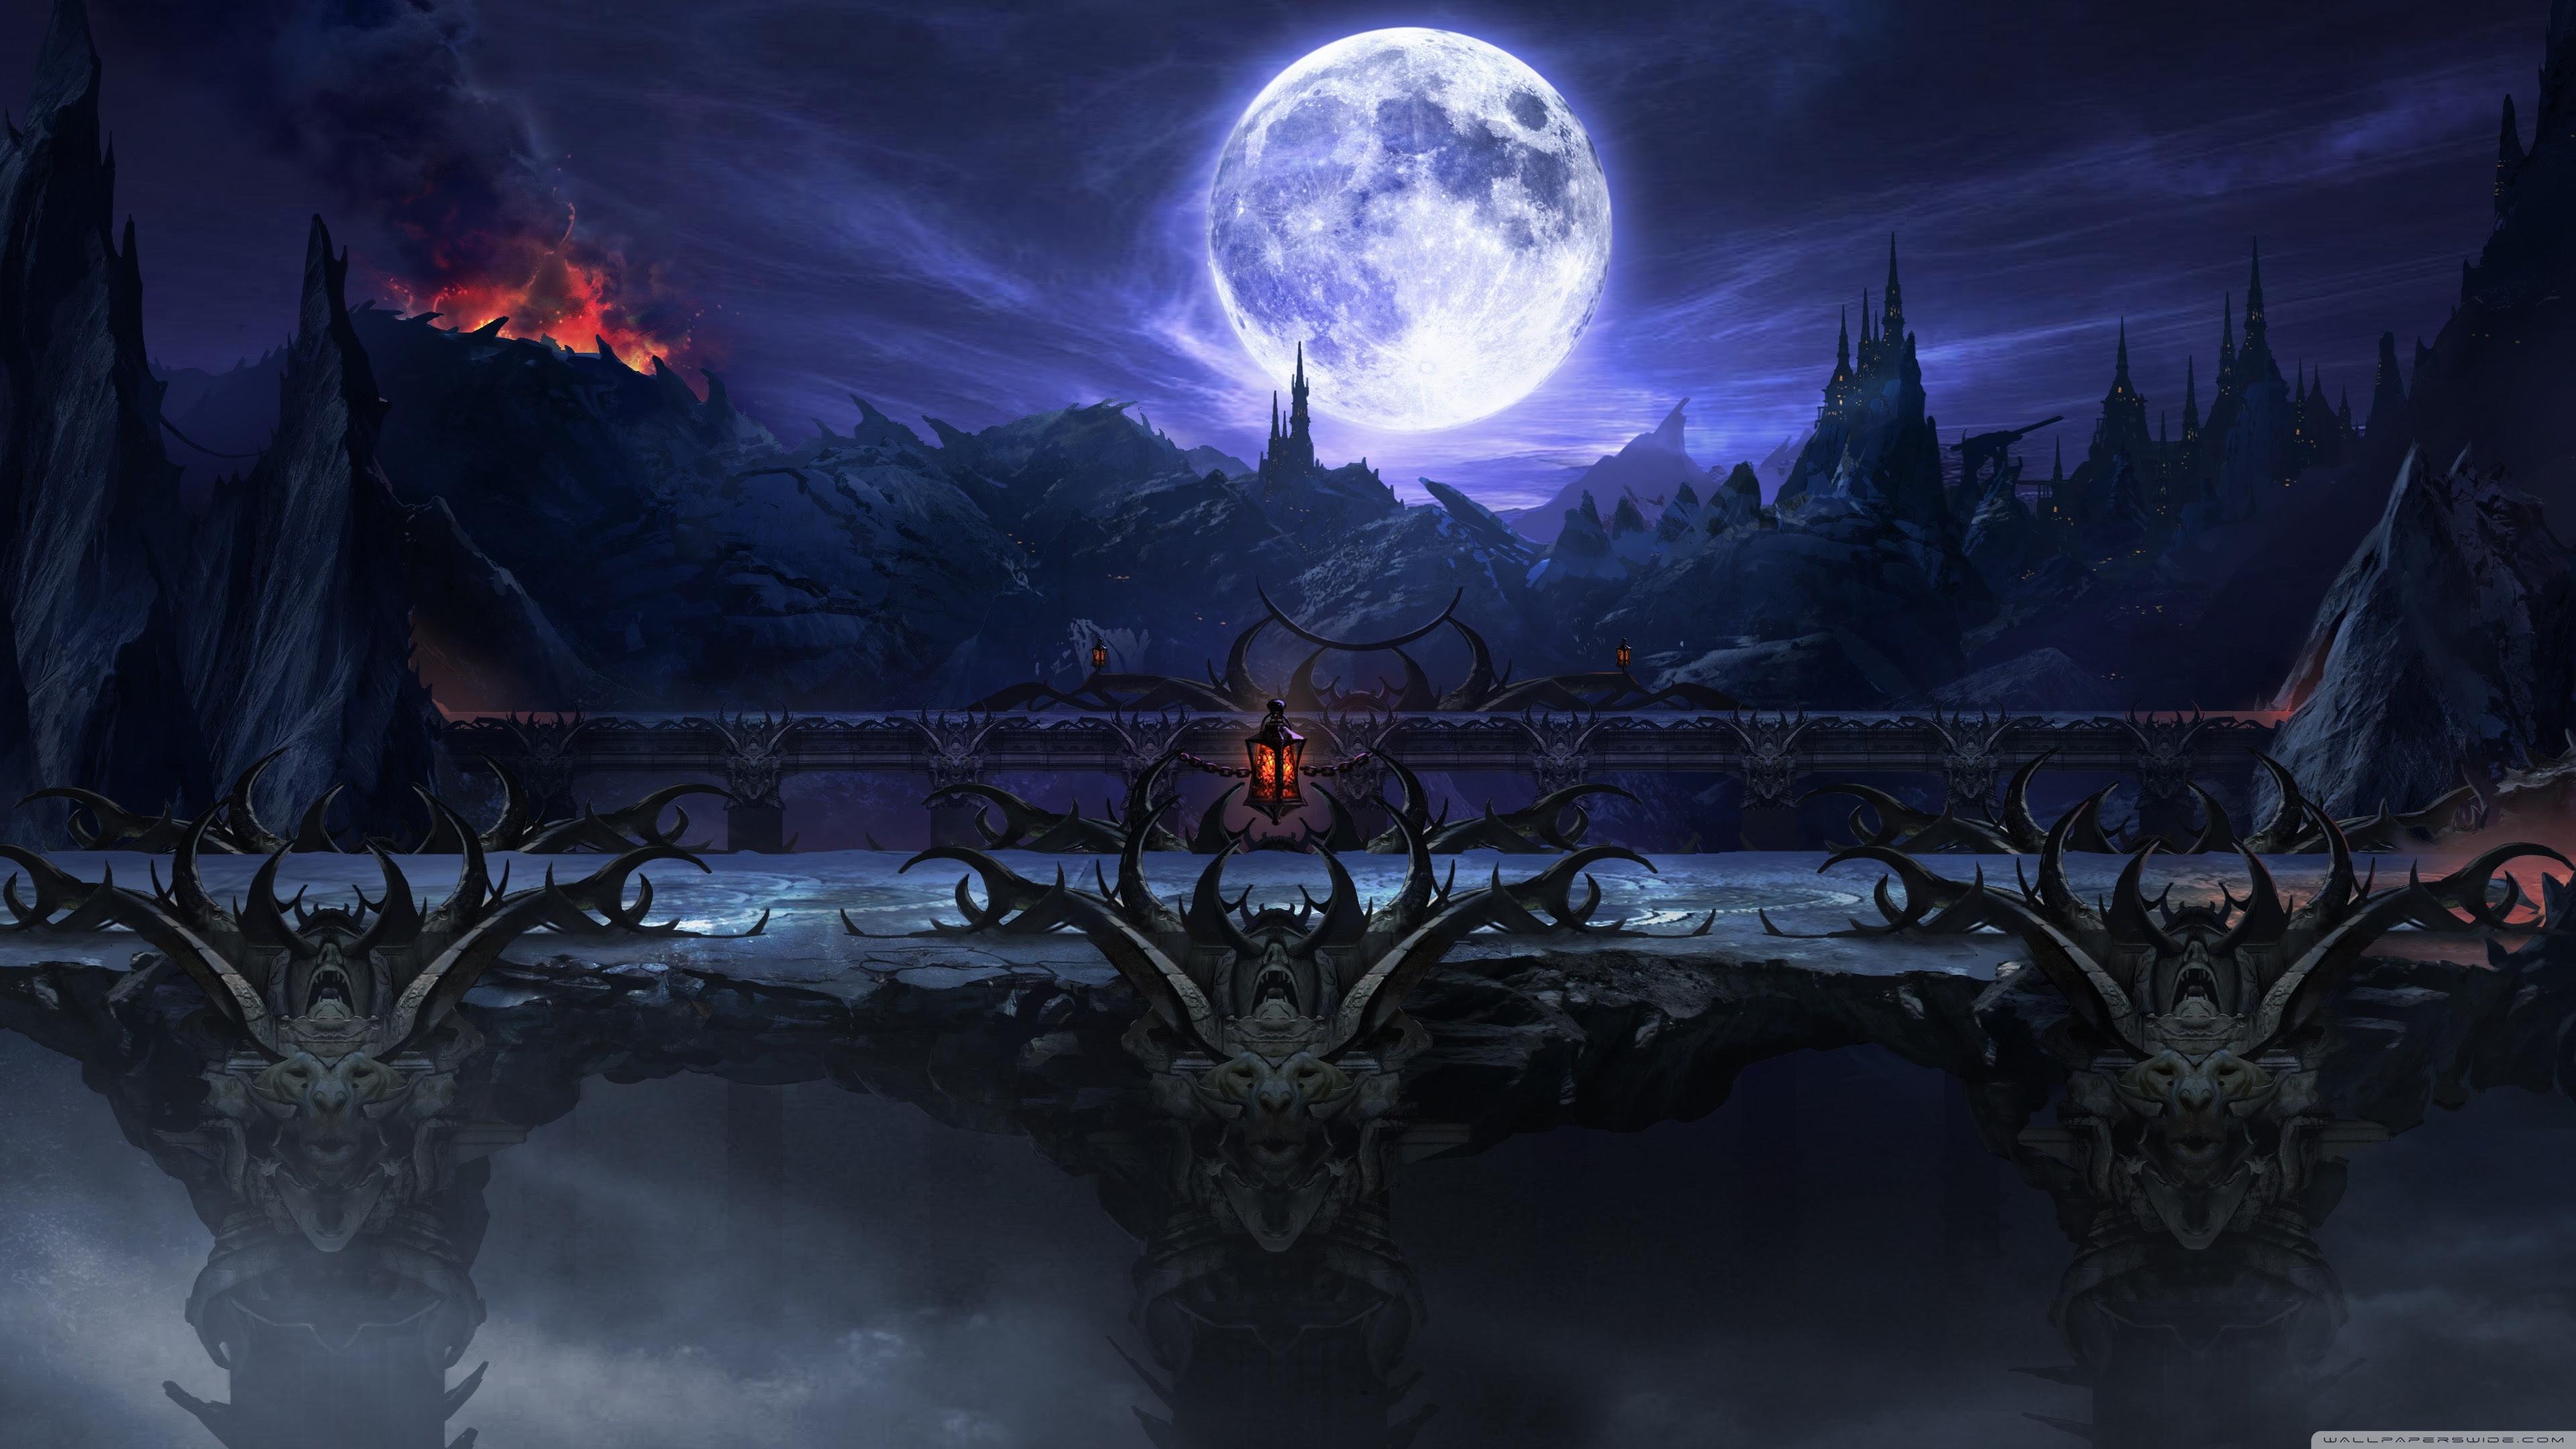 Mortal Kombat Background Wallpaper 3840x2160 83527